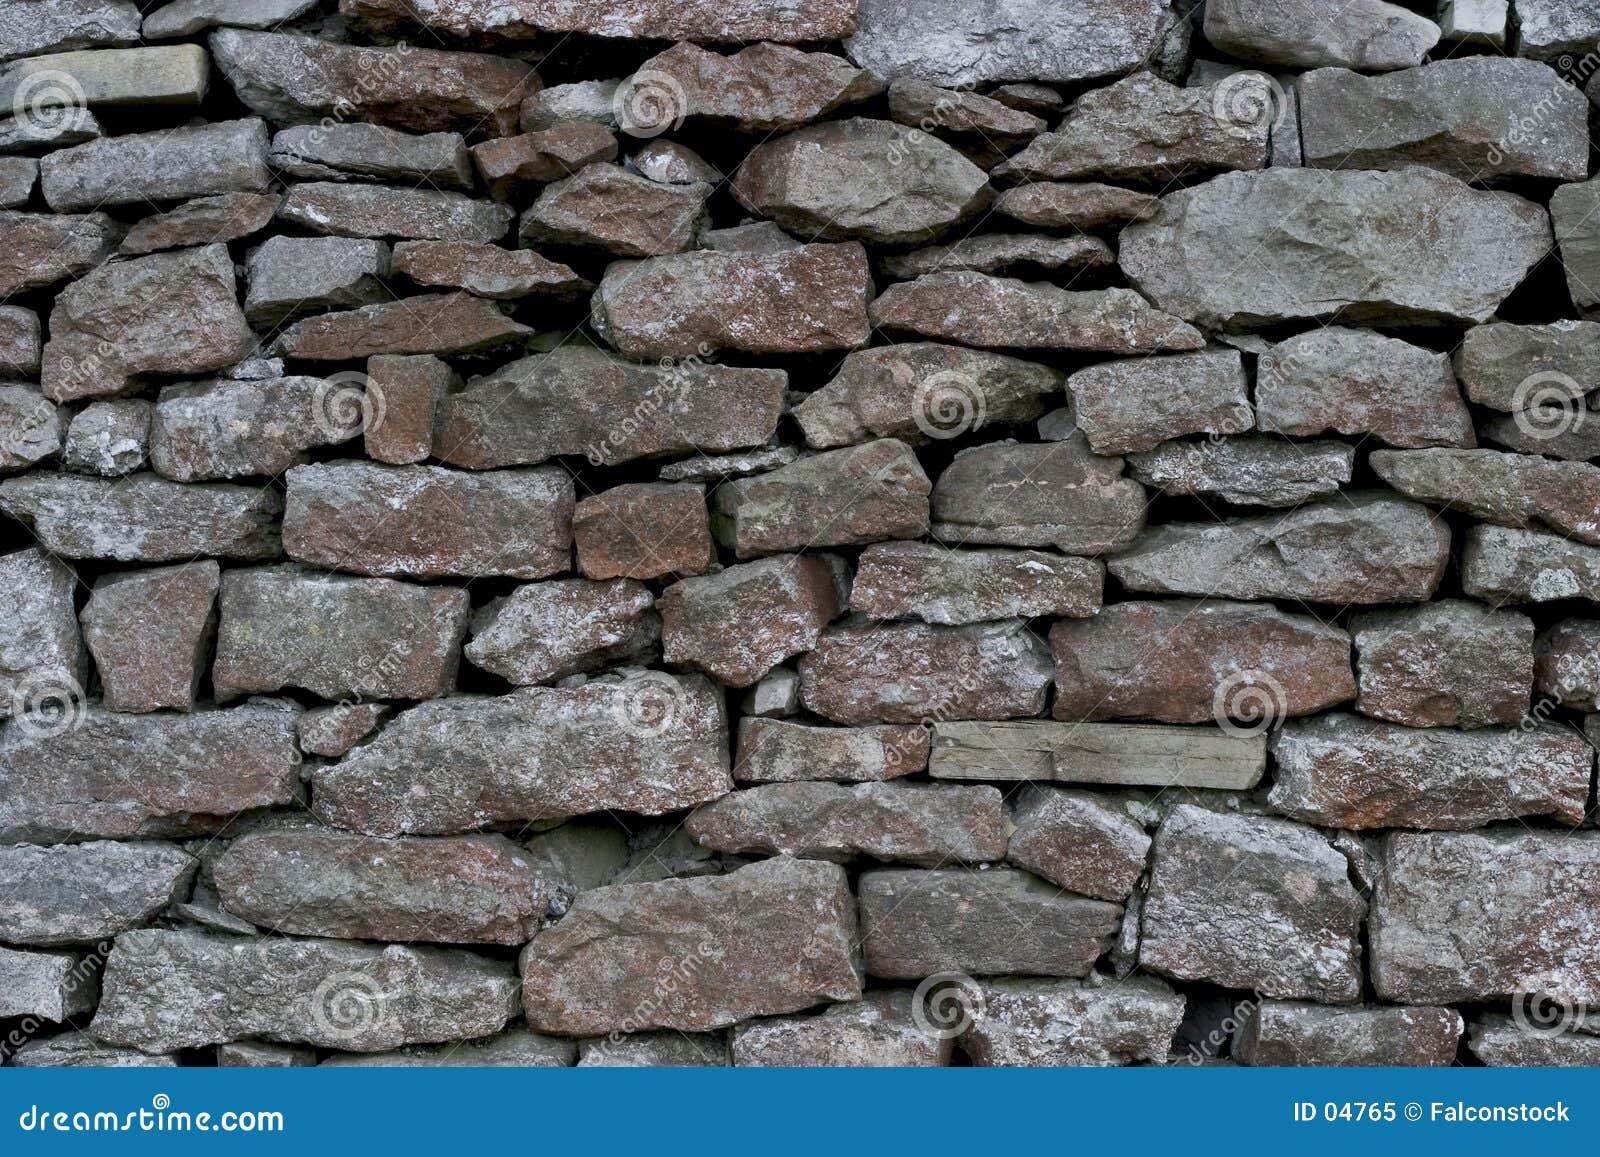 Pared Drystone - piedra caliza